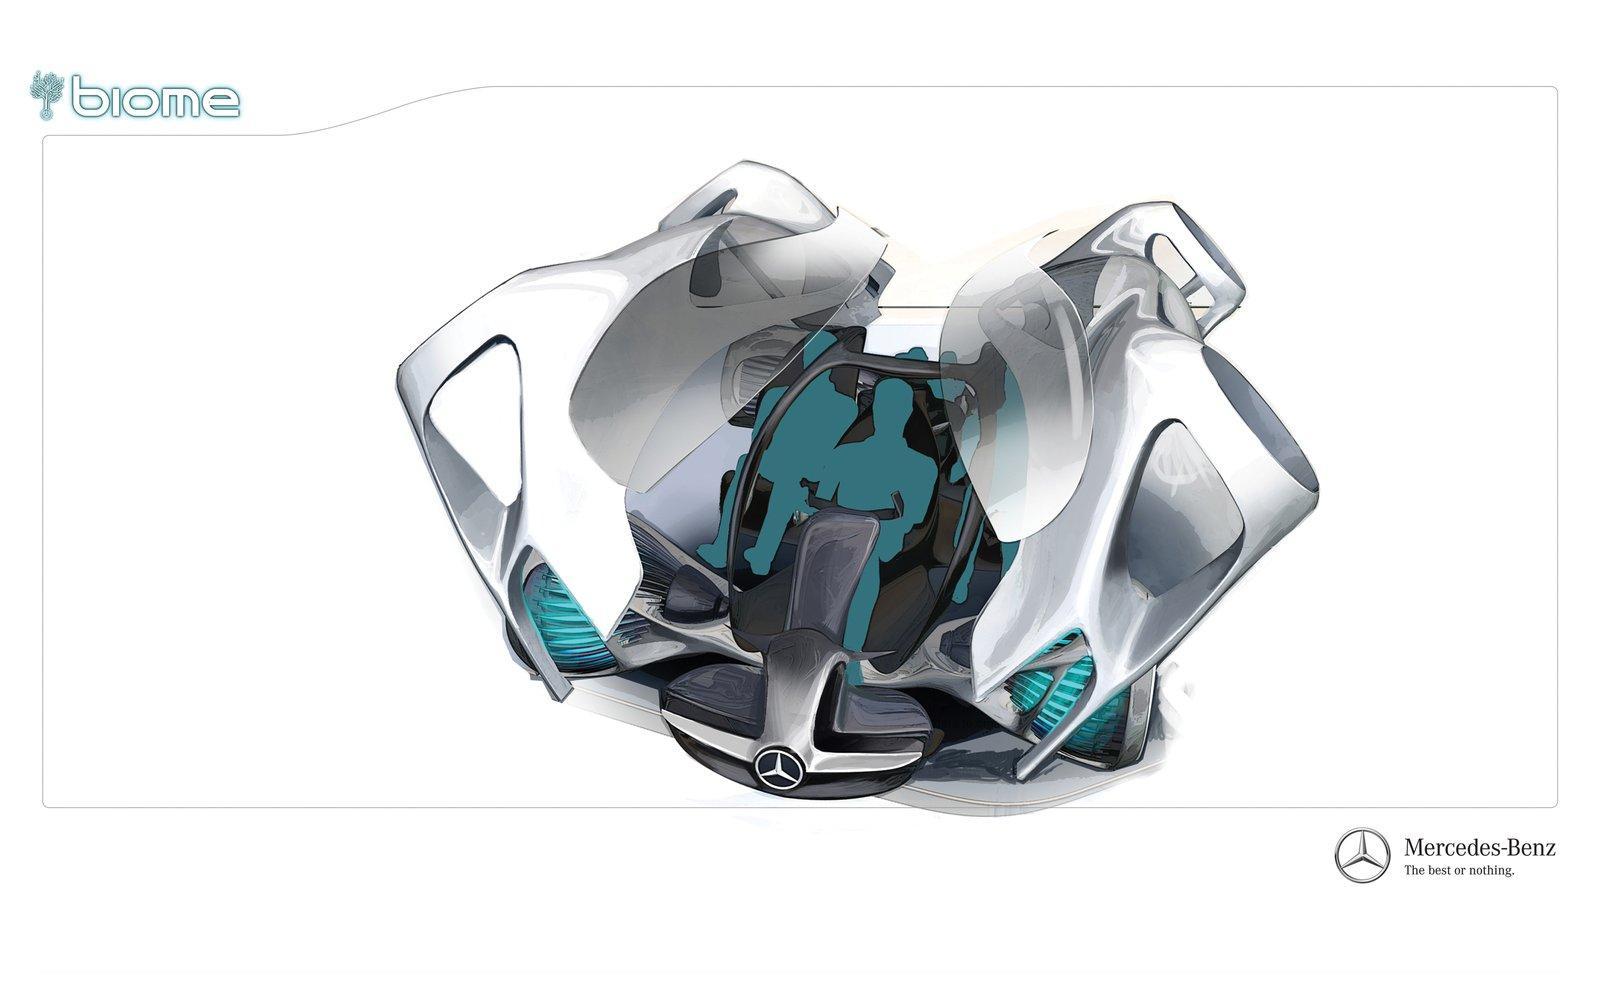 Los angeles 2010 mercedes biome la voiture d 39 avatar for Mercedes benz biome cost